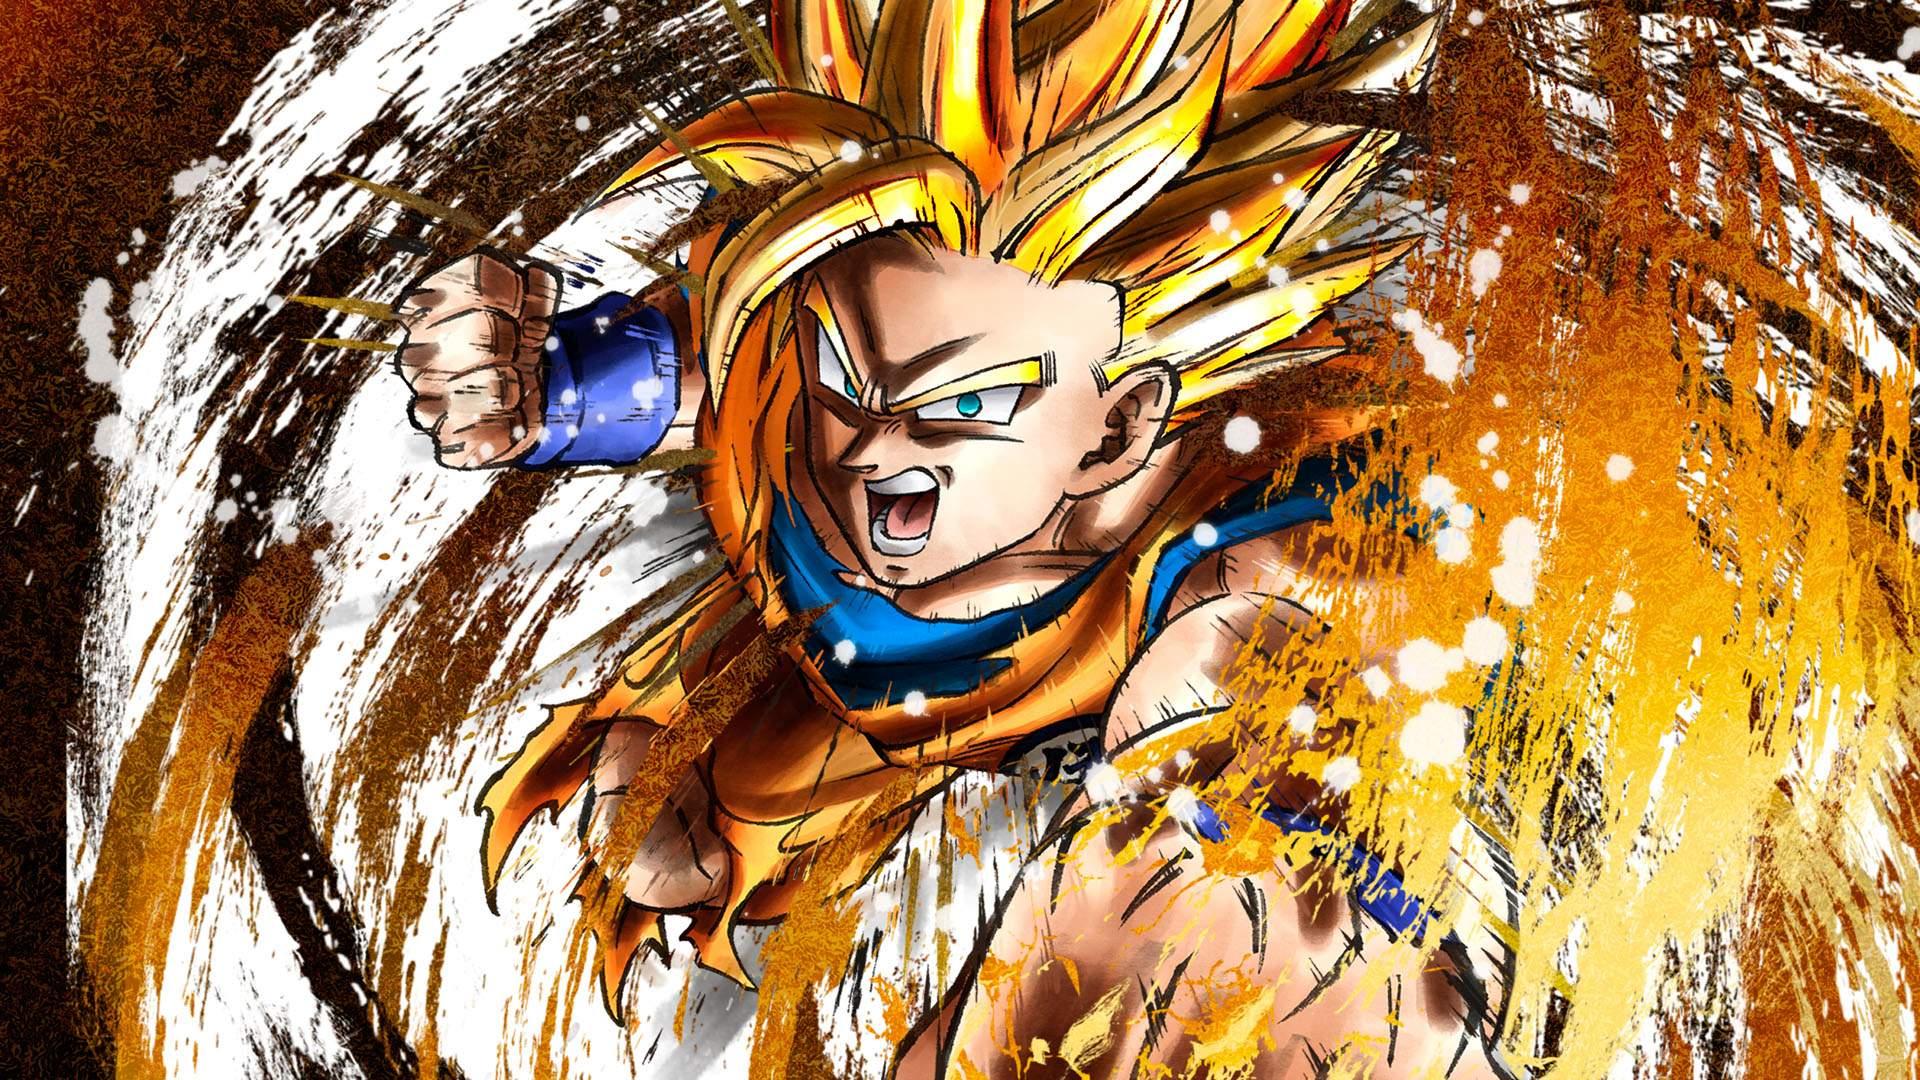 19 Nov 2017 ... descargar Saiyan Ultimate: Xenoverse Battle 1.0 Android APK : Super Saiyan  xenoverse torneo de batalla 2 de bola de energía y goku...